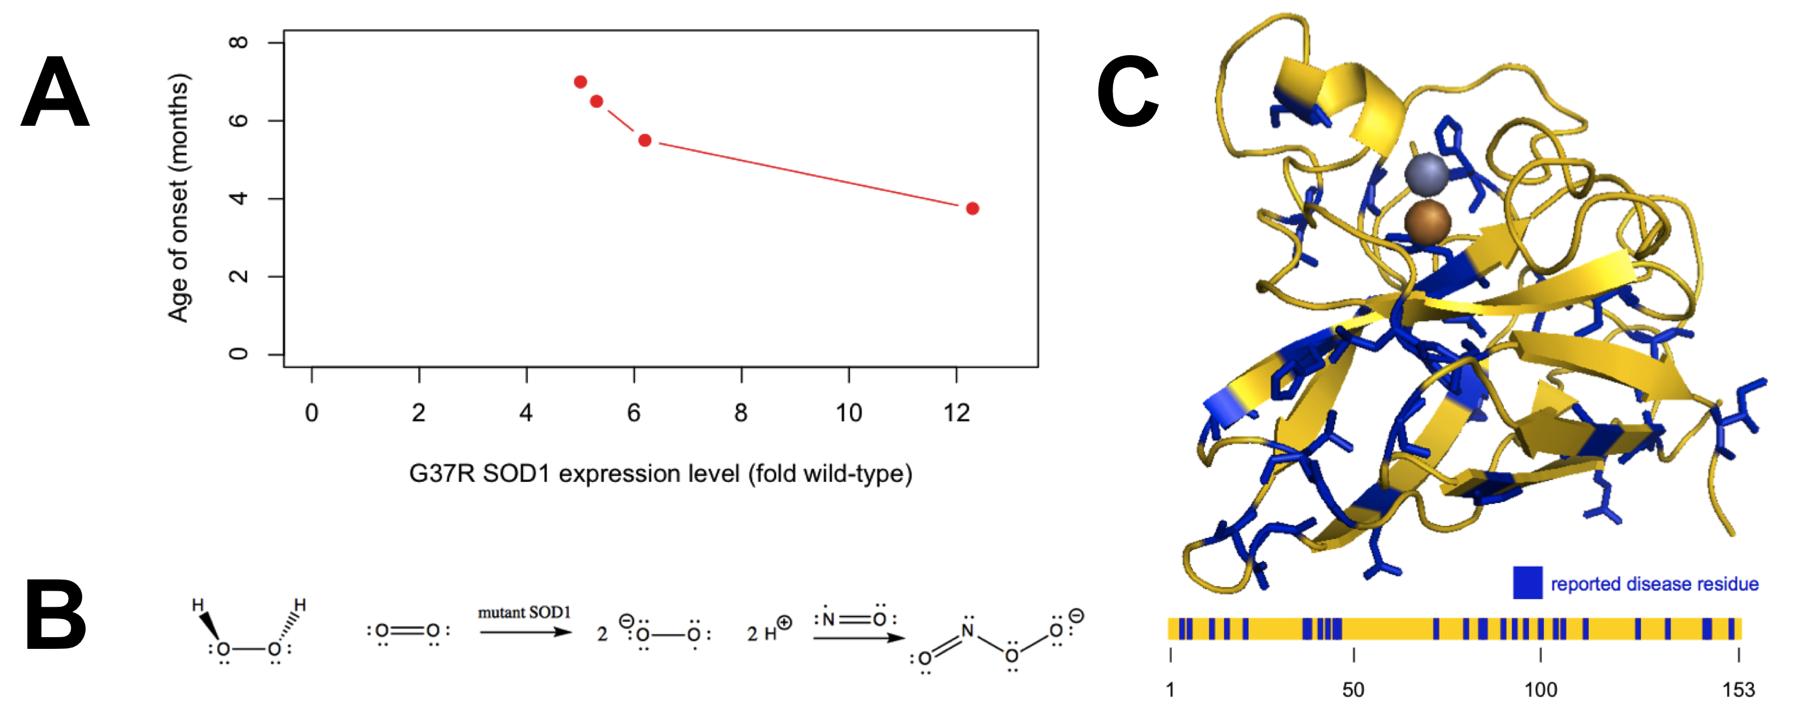 protein folding research paper Research review paper bioprocessing strategies to improve heterologous protein production in filamentous fungal fermentations liping wanga, darin ridgwaya,, tingyue gua, murray moo-youngb.